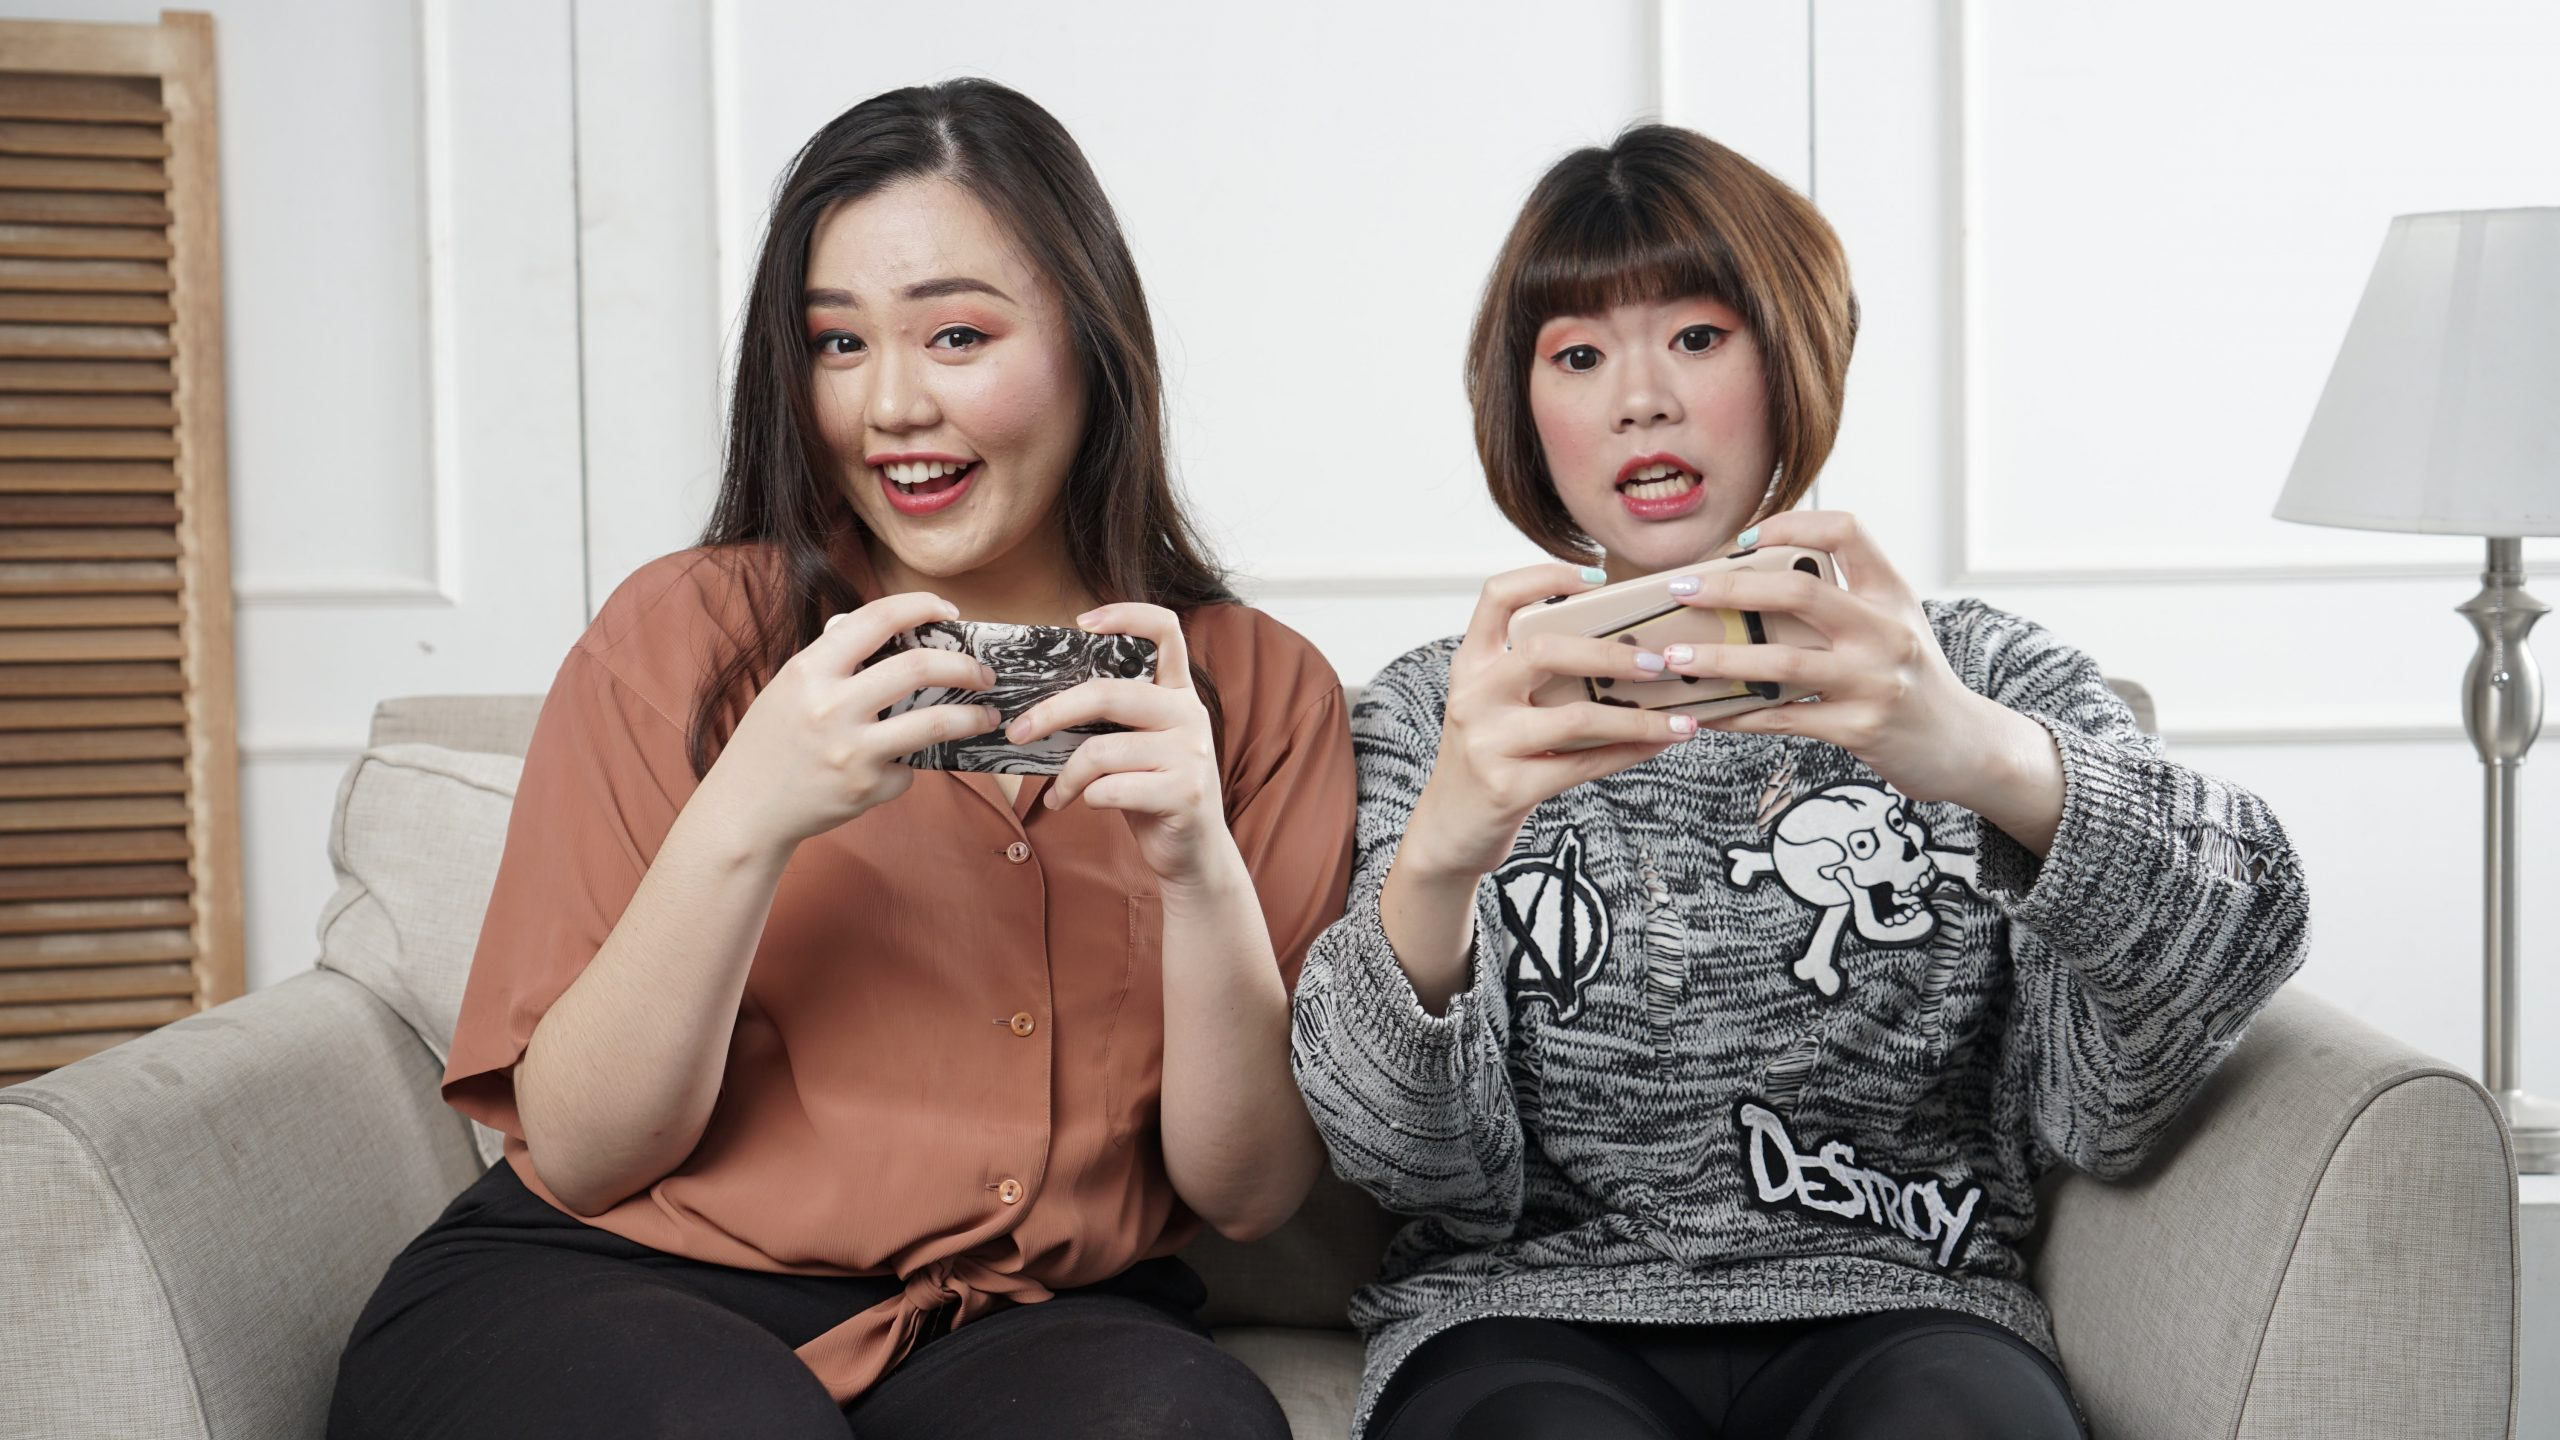 69,8% das mulheres no Brasil jogam videogames Foto: Afif Kusuma